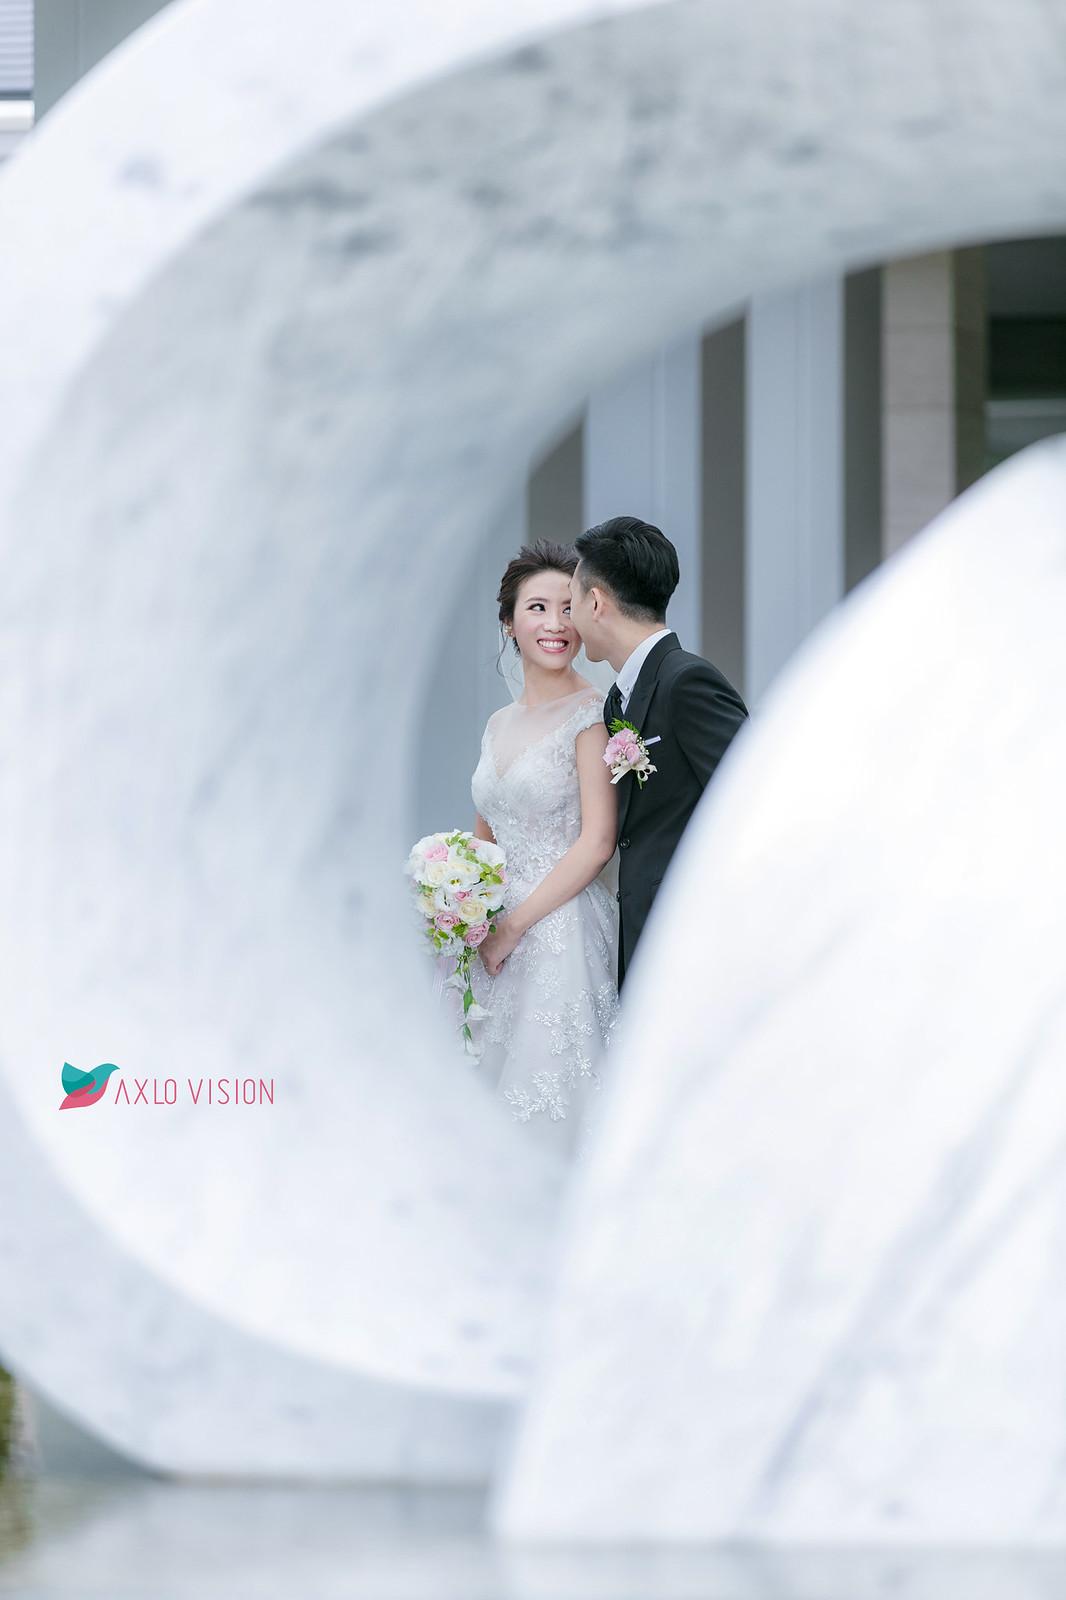 20170916 WeddingDay_086